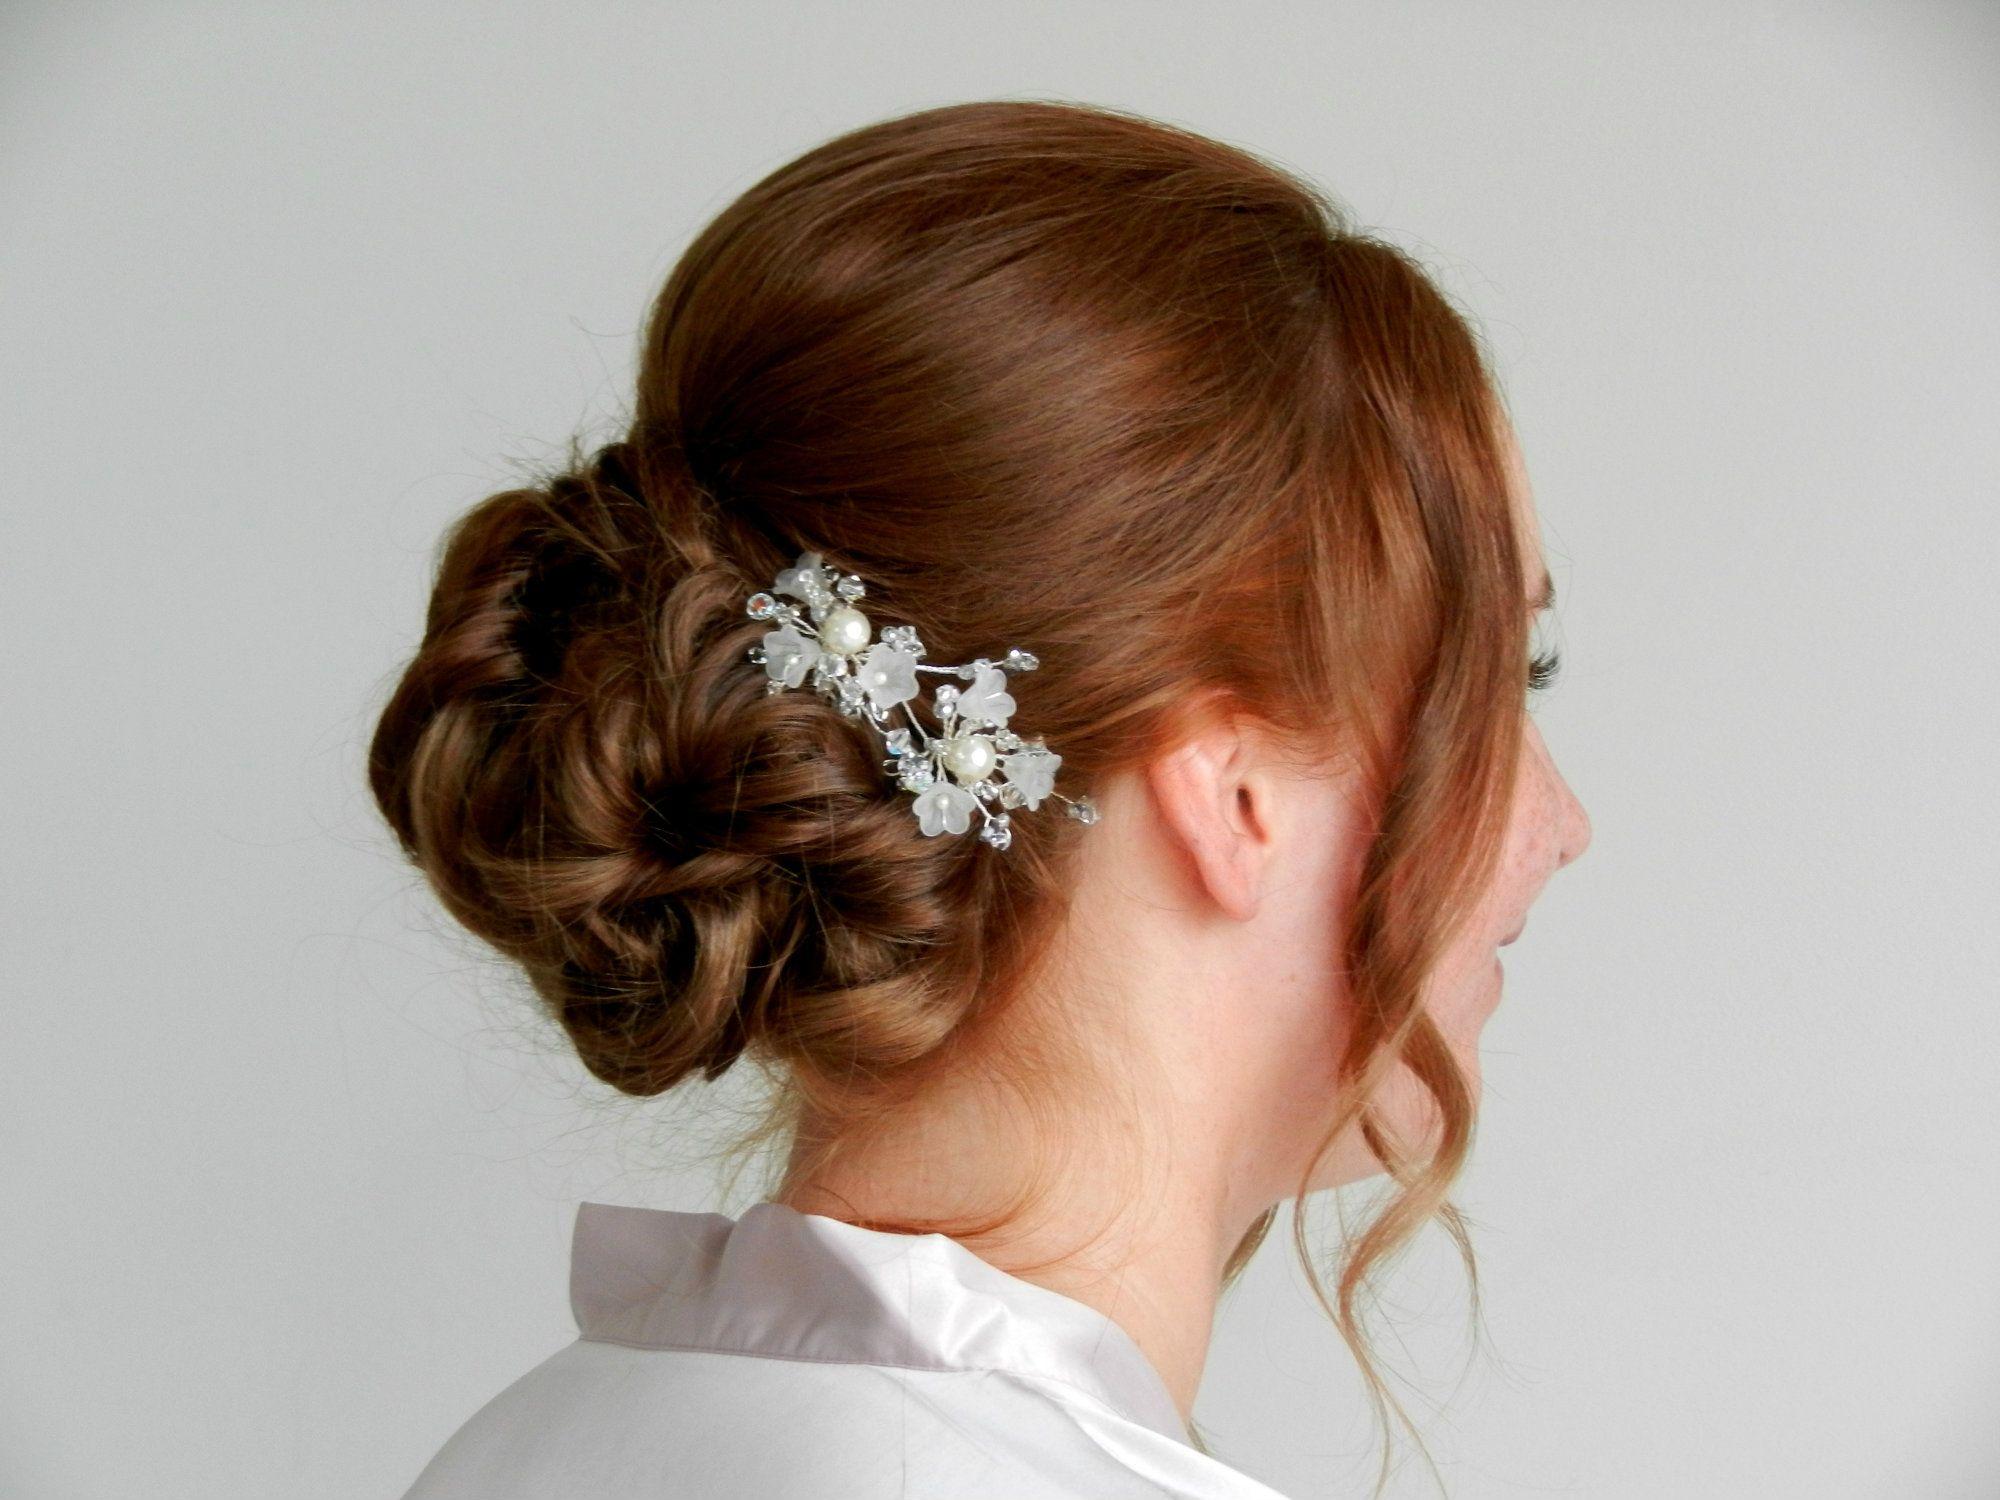 whit-pink-flower-bridal-wedding-hair-accessories-UK